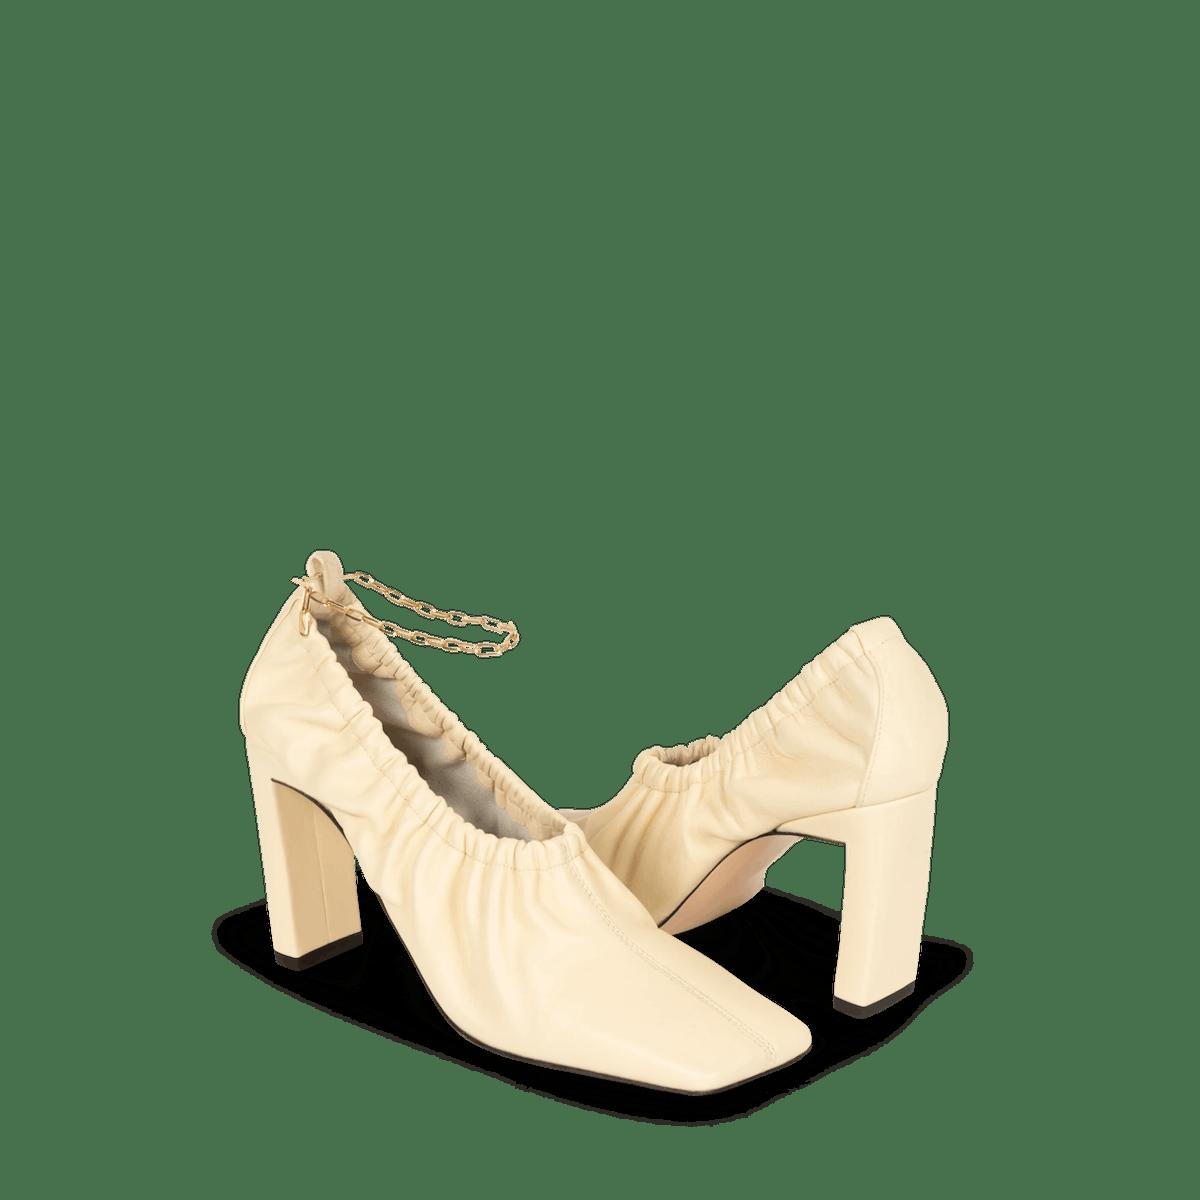 x Lizzie Mandler - Mia Mule Gold Anklet